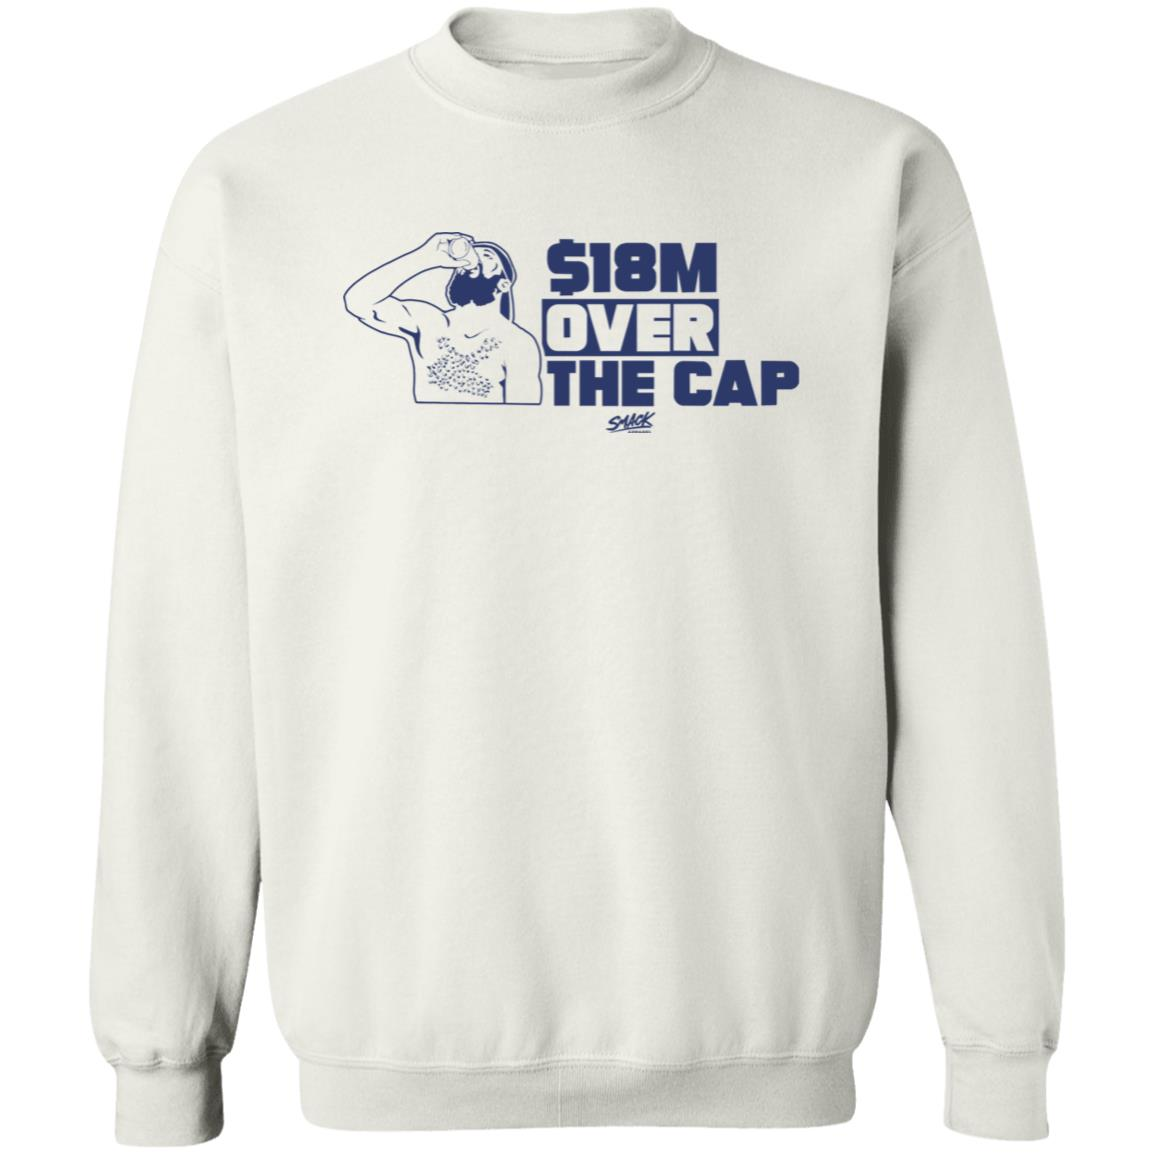 18M Over The Cap Shirt Smackapparel Merch 18M Over The Cap Shirt Hoodie Sweatshirt